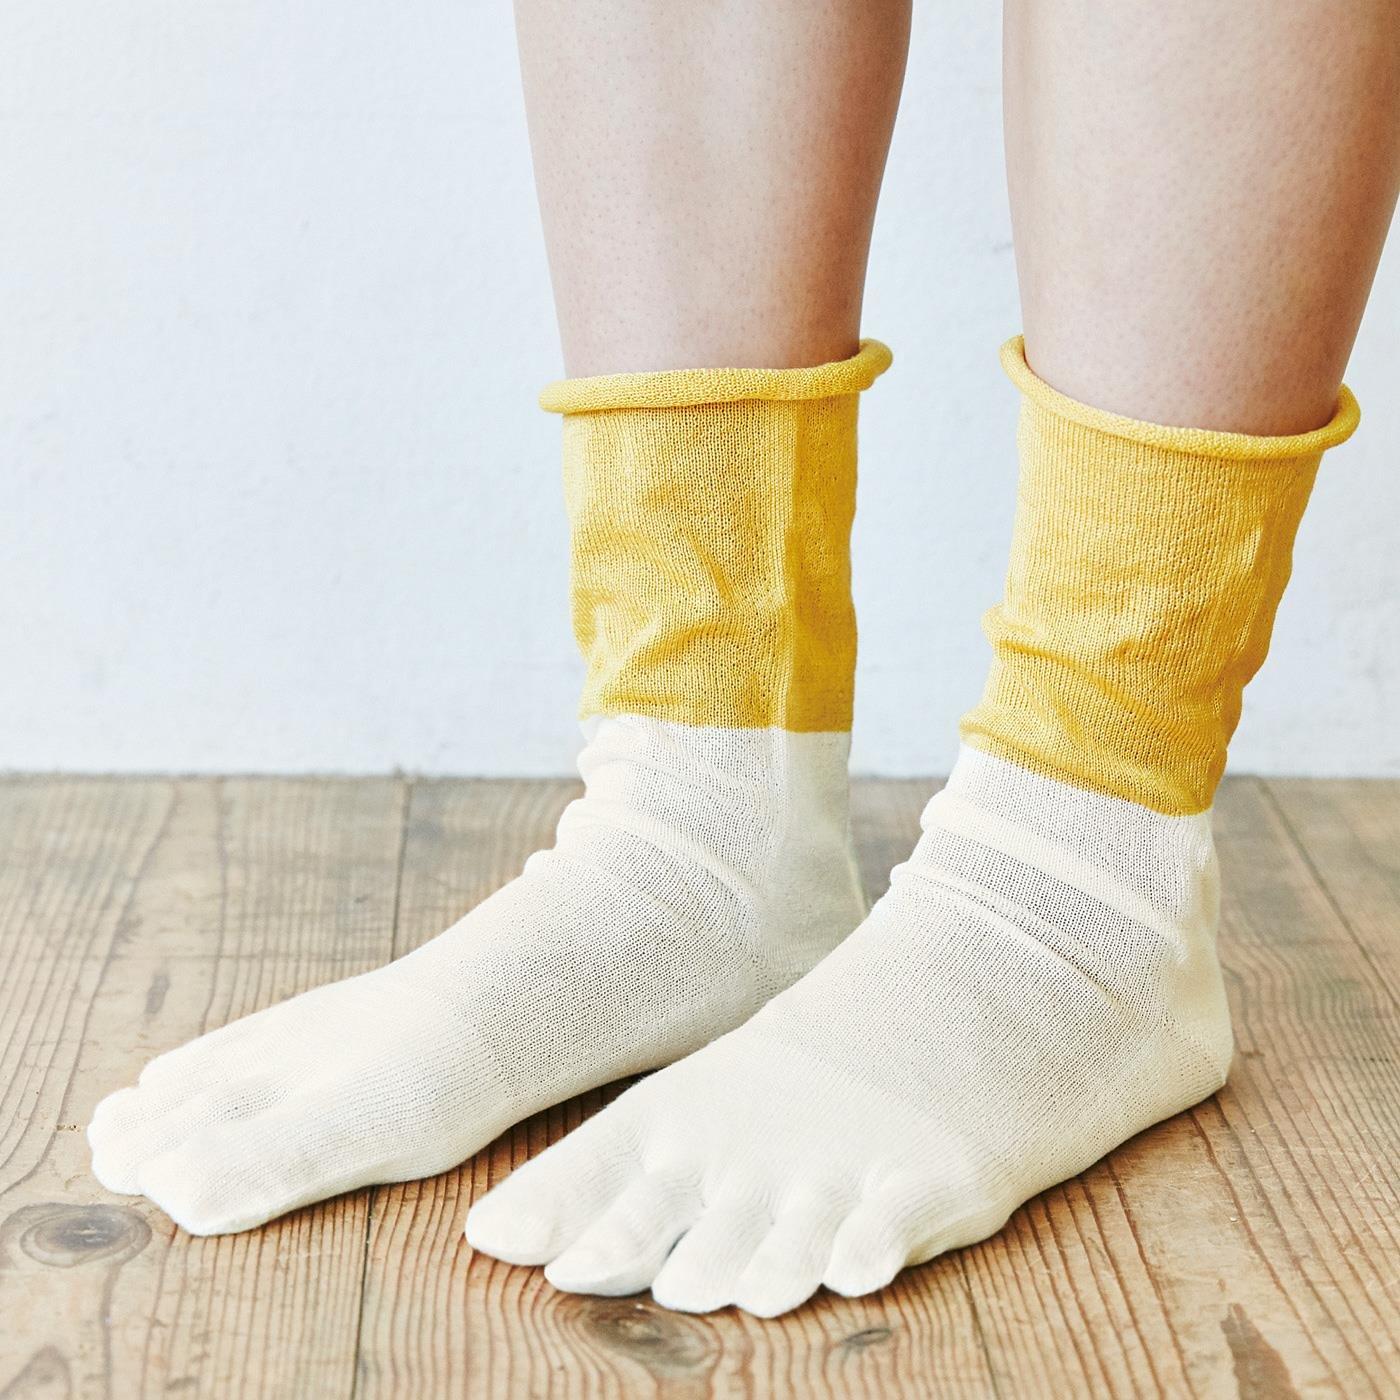 el:ment×naomi ito 毎日はきたい! 足先ふわりで心地よい シルク100%インナー靴下の会